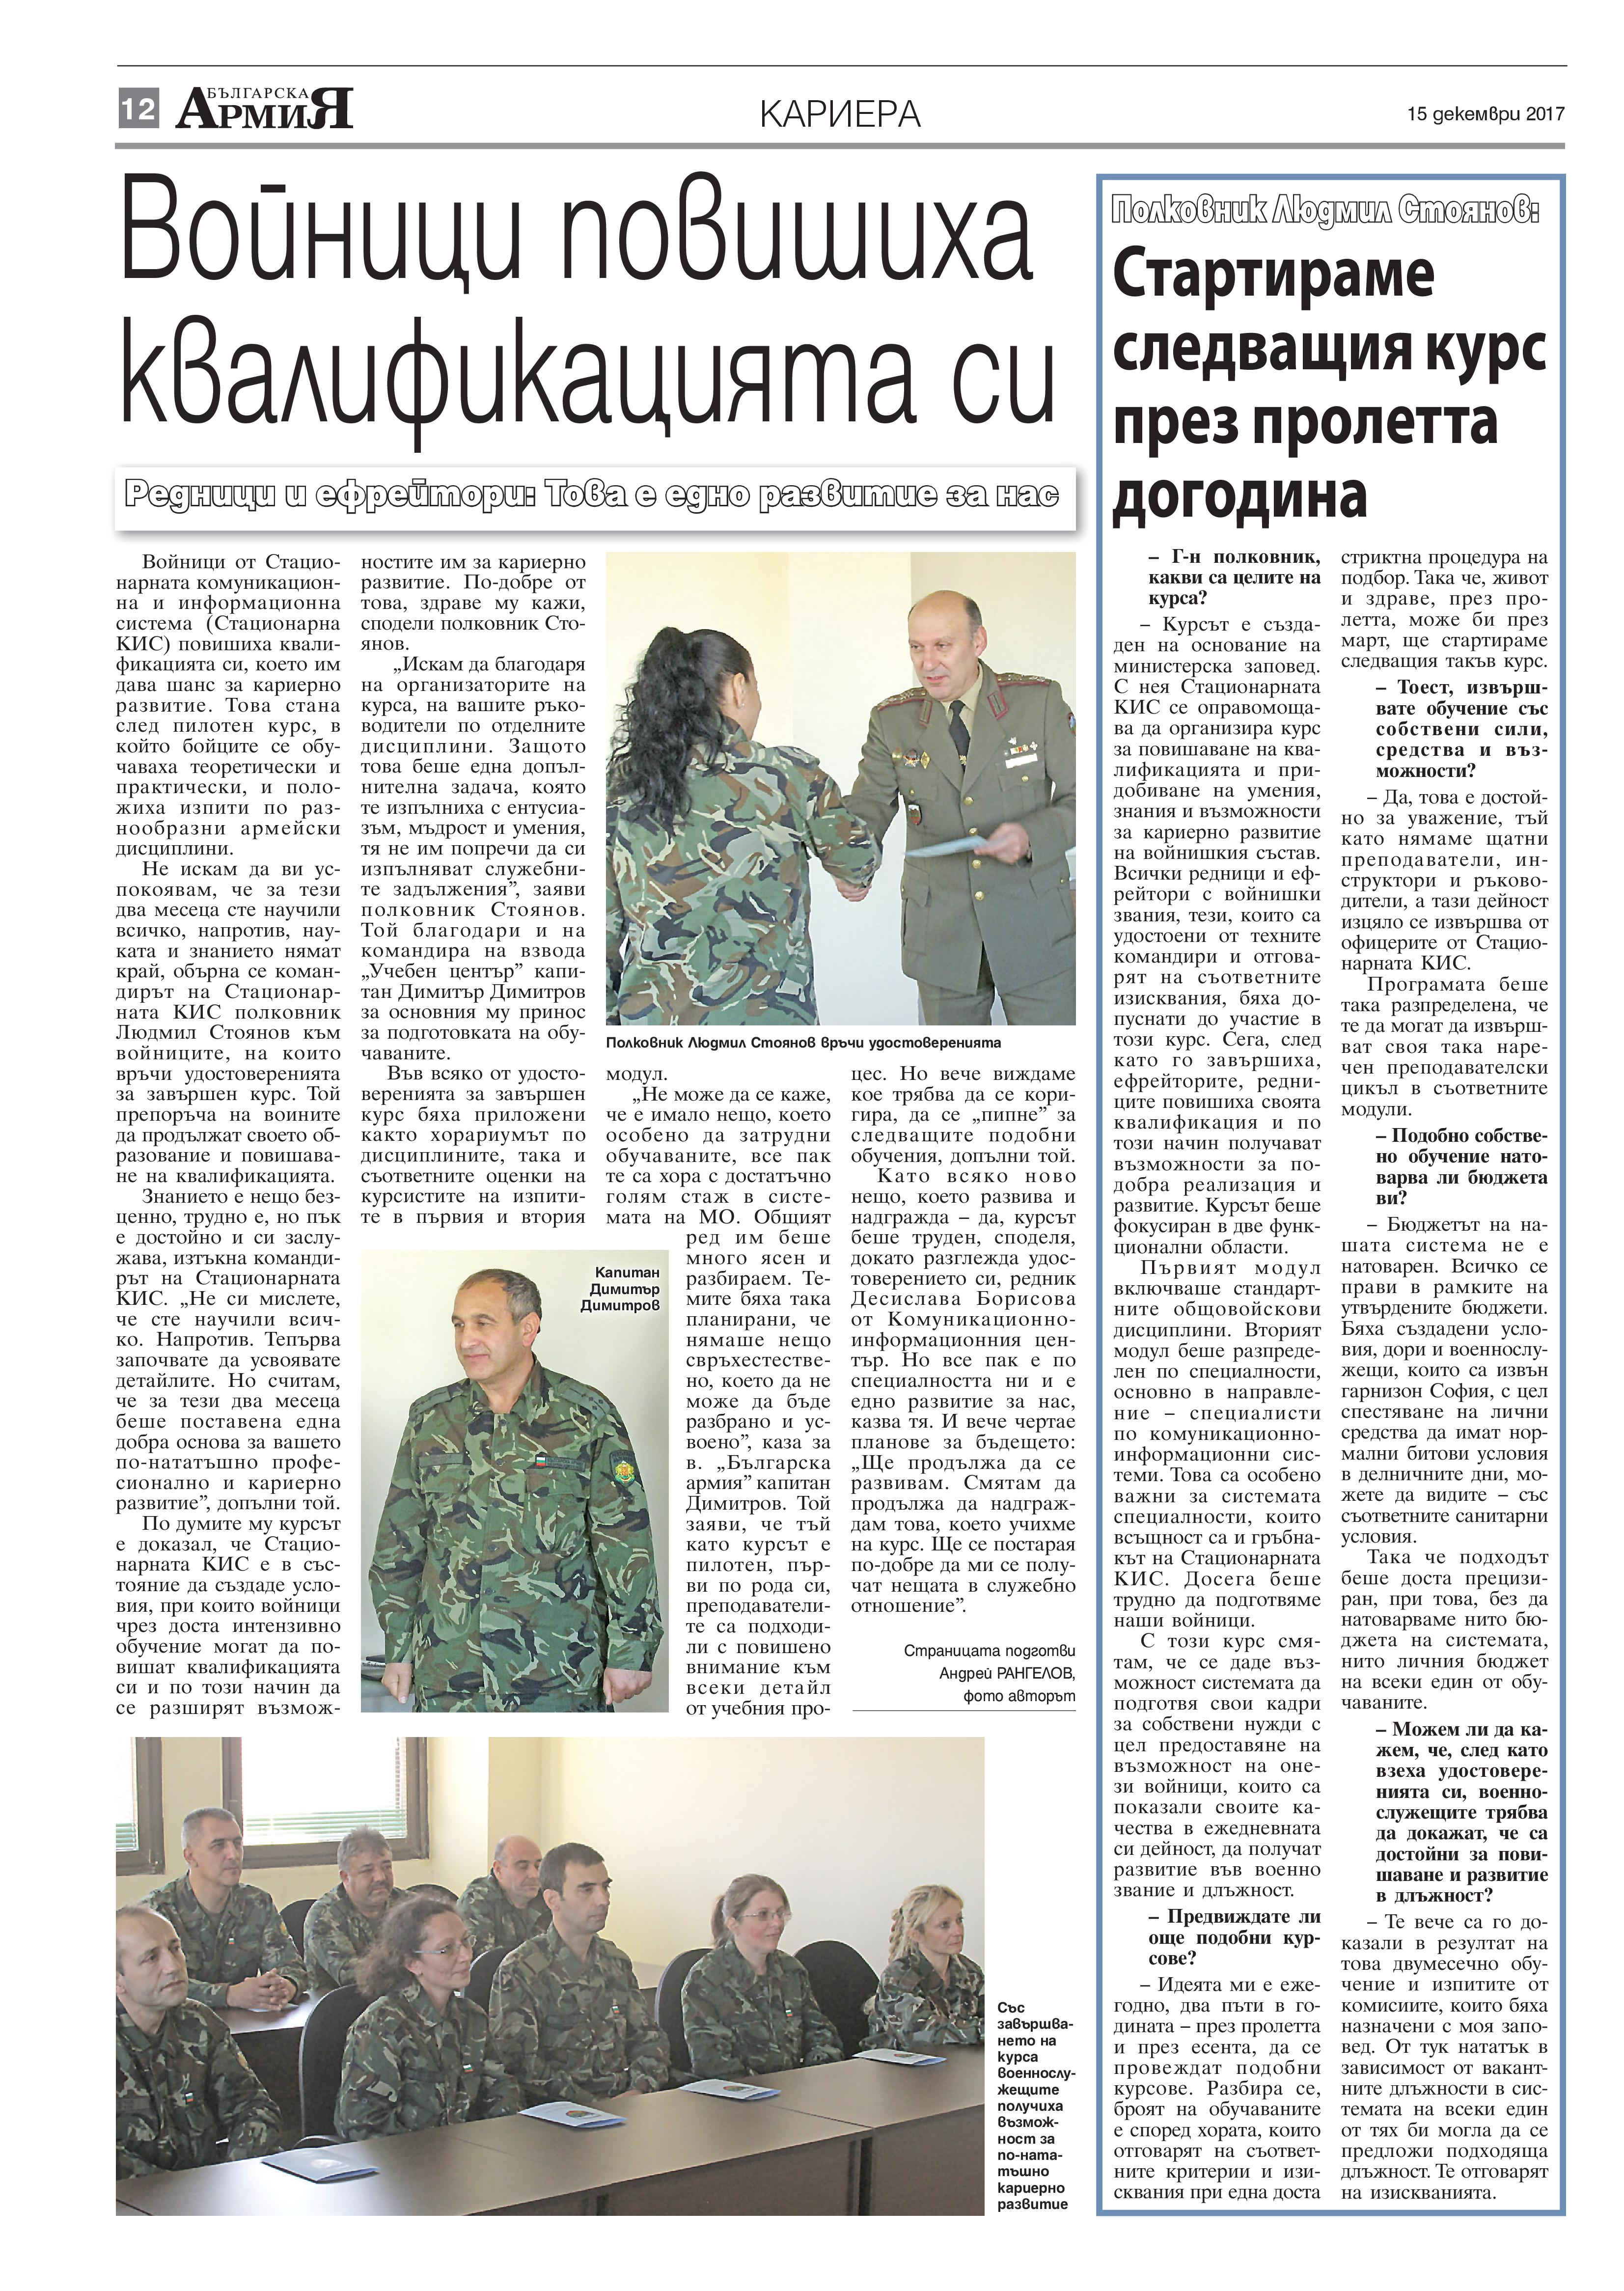 https://armymedia.bg/wp-content/uploads/2015/06/12-15.jpg